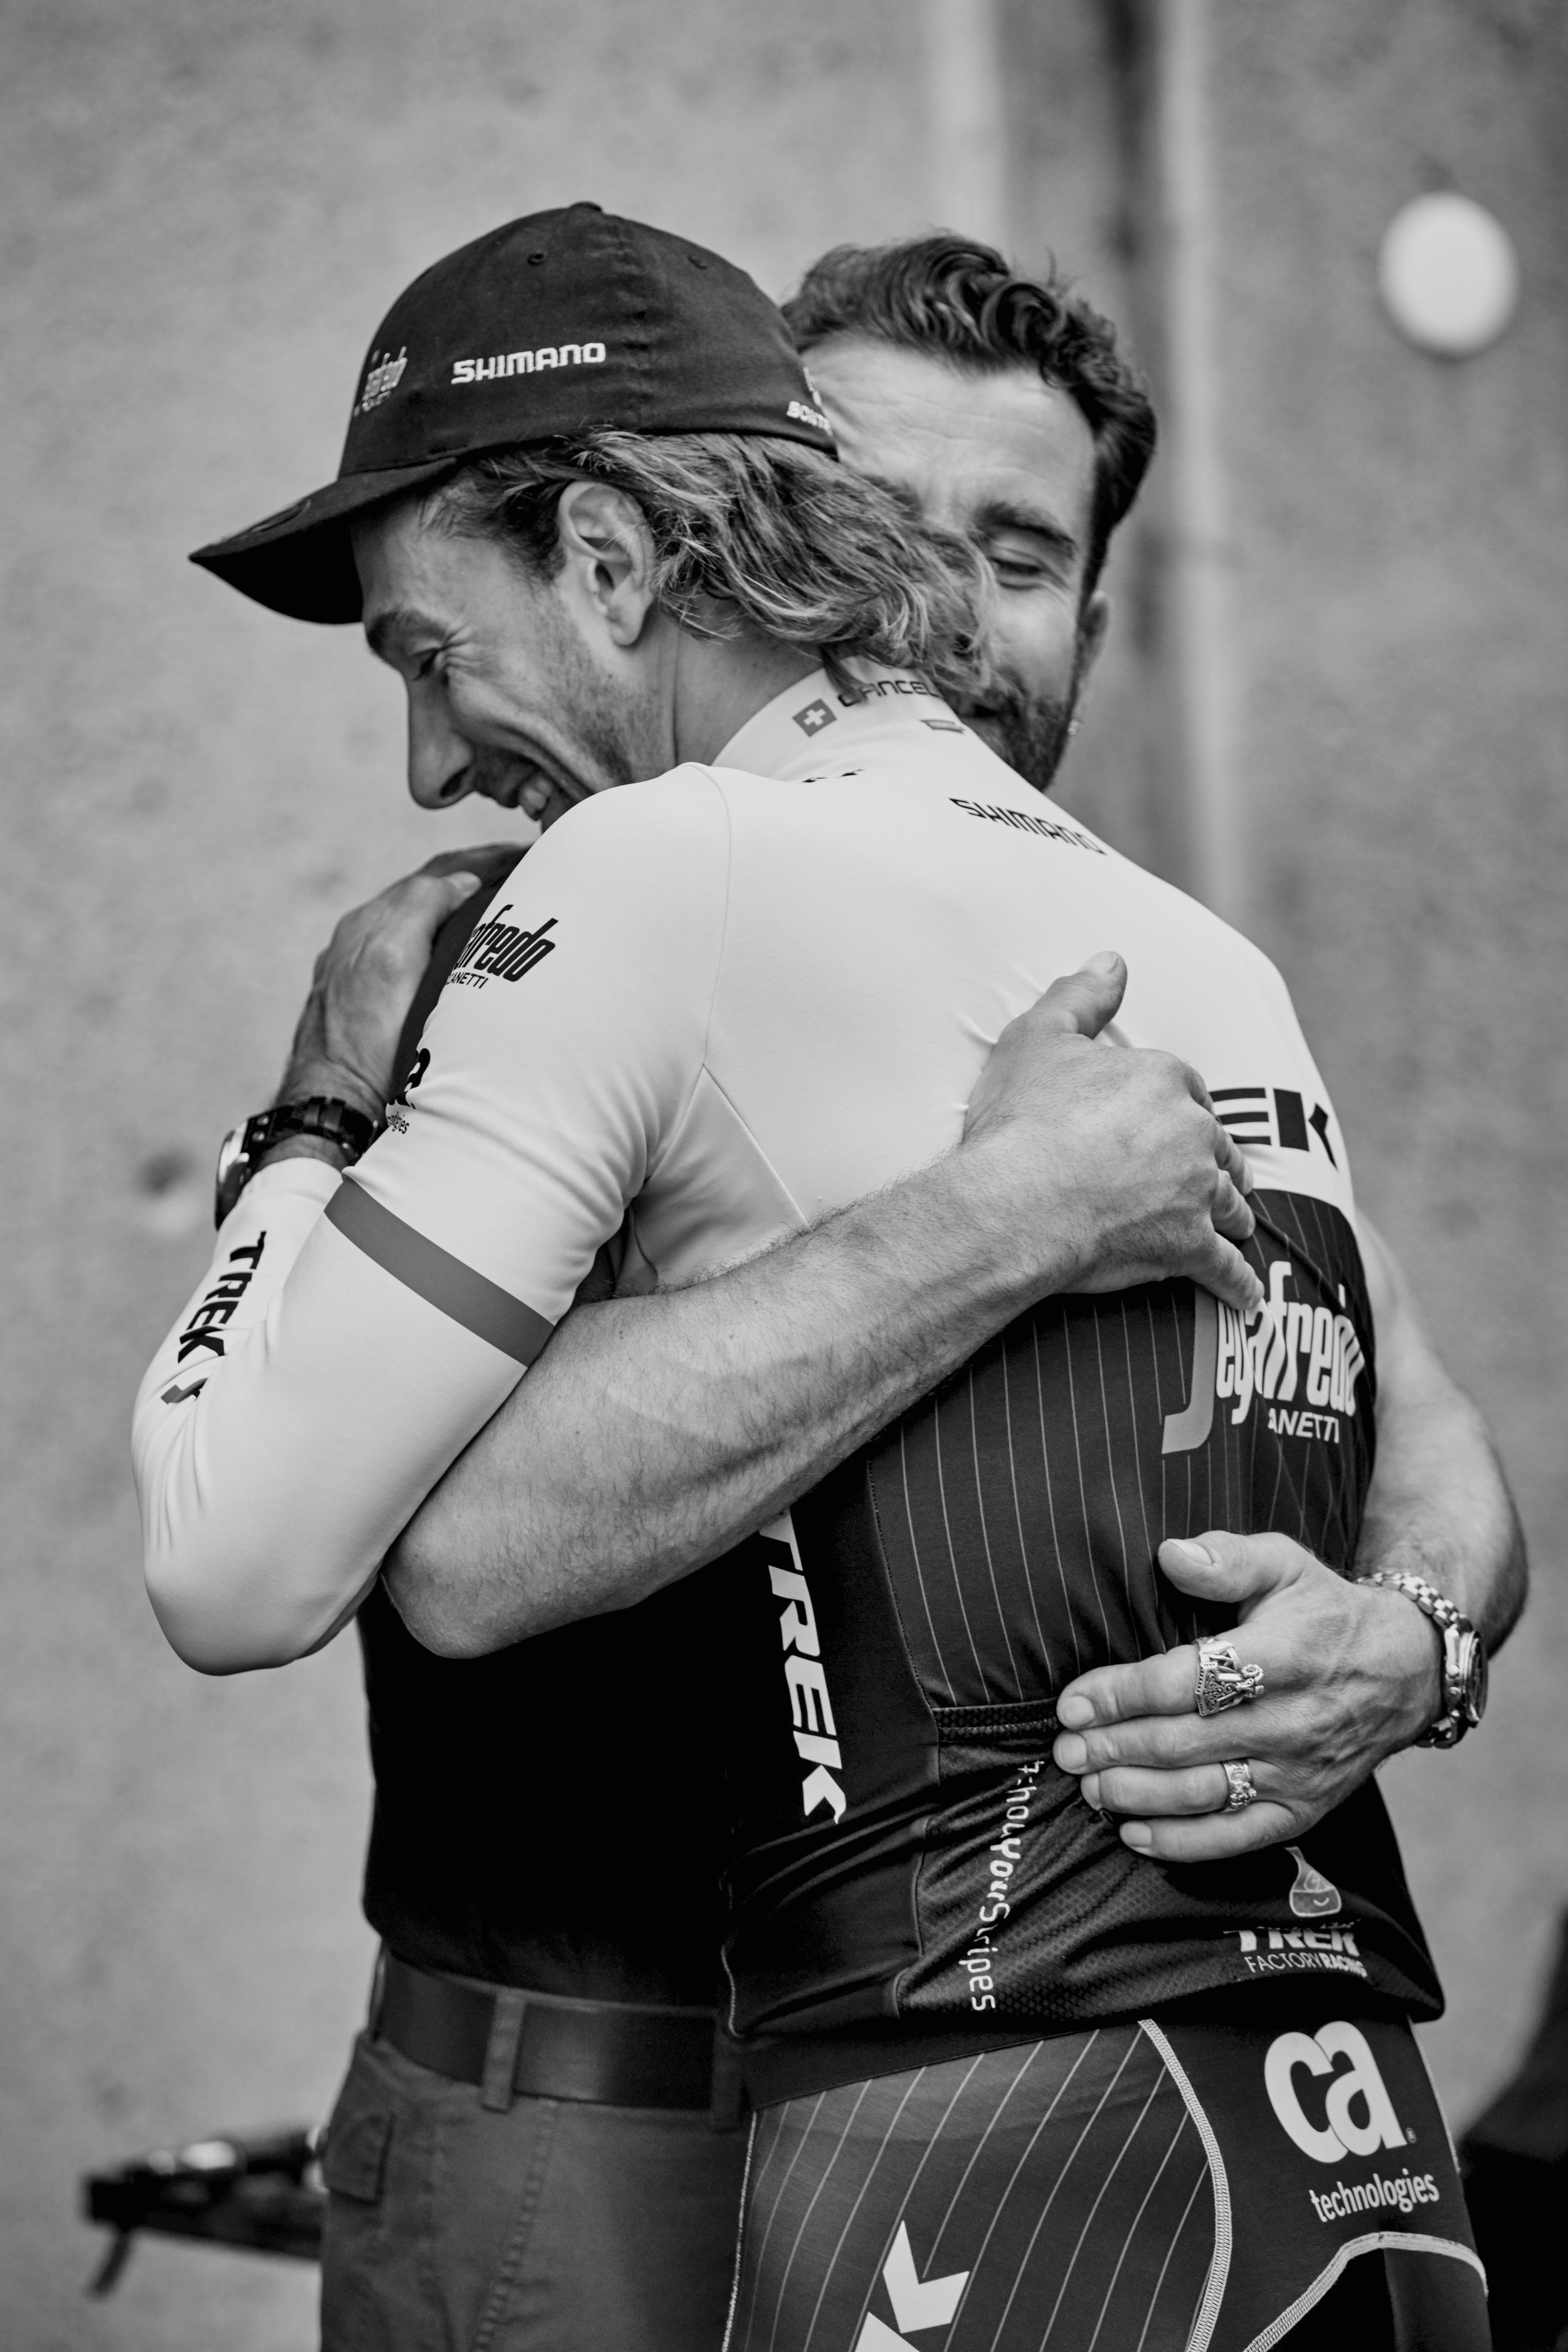 ... hugs his Mechanic Roger